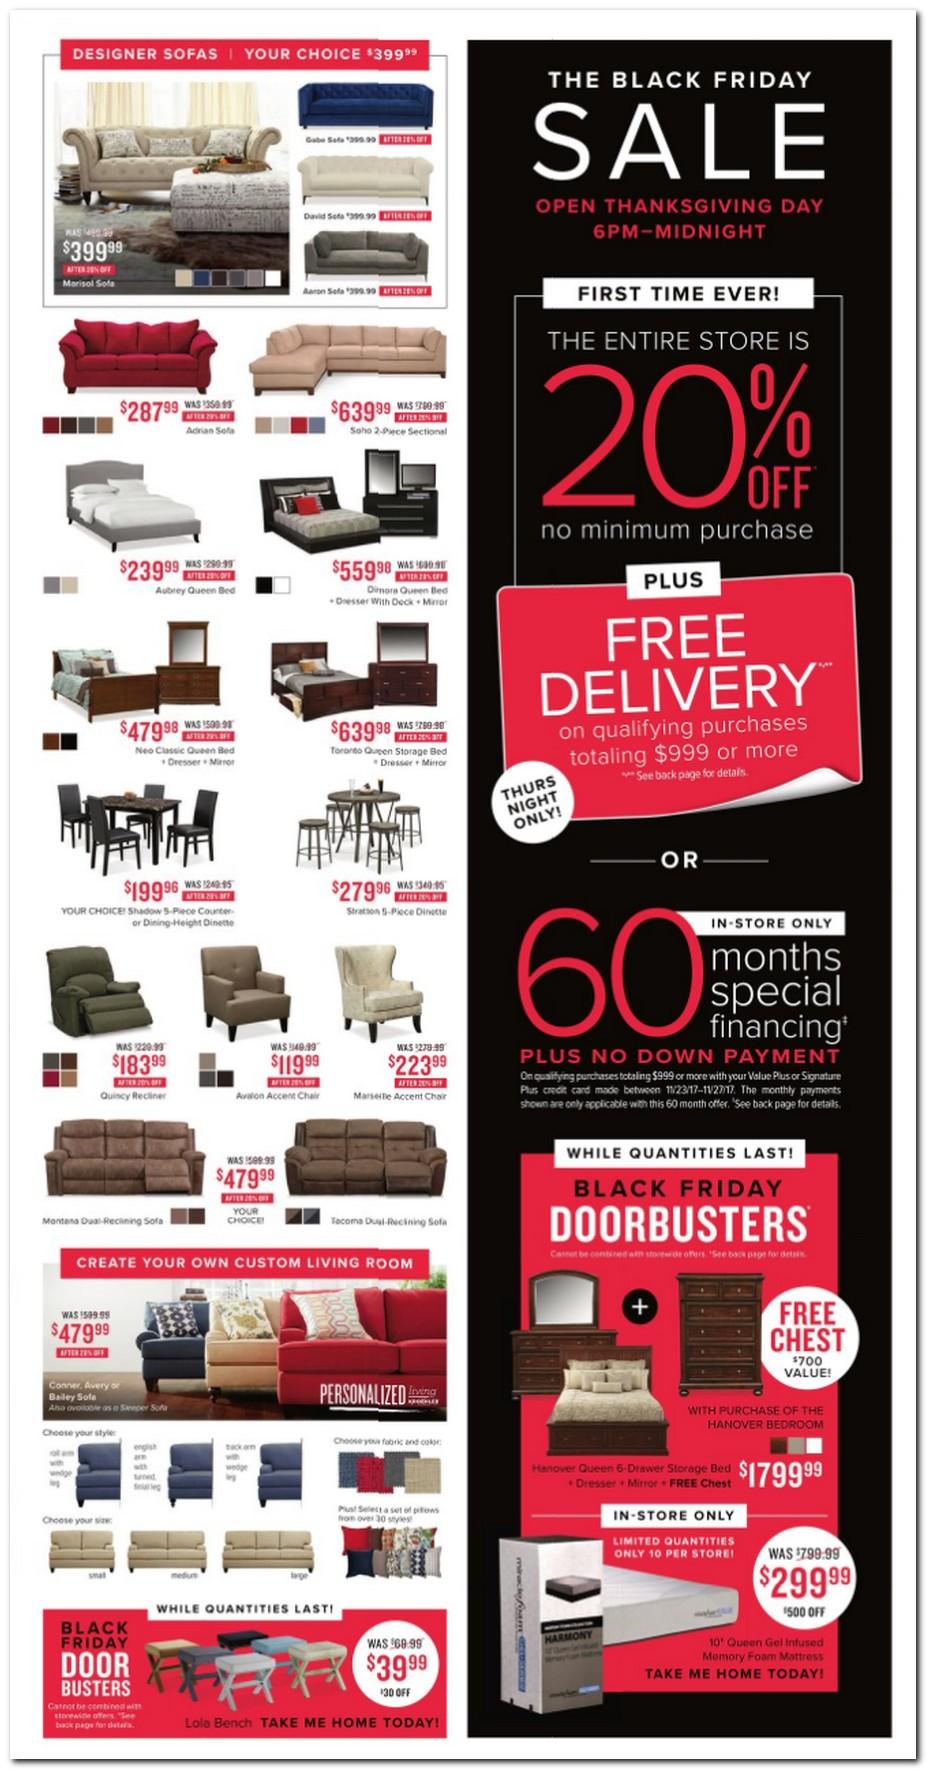 Value City Furniture Black Friday Ads Sales Deals 2017 Promo Codes Deals 2018  CouponShy